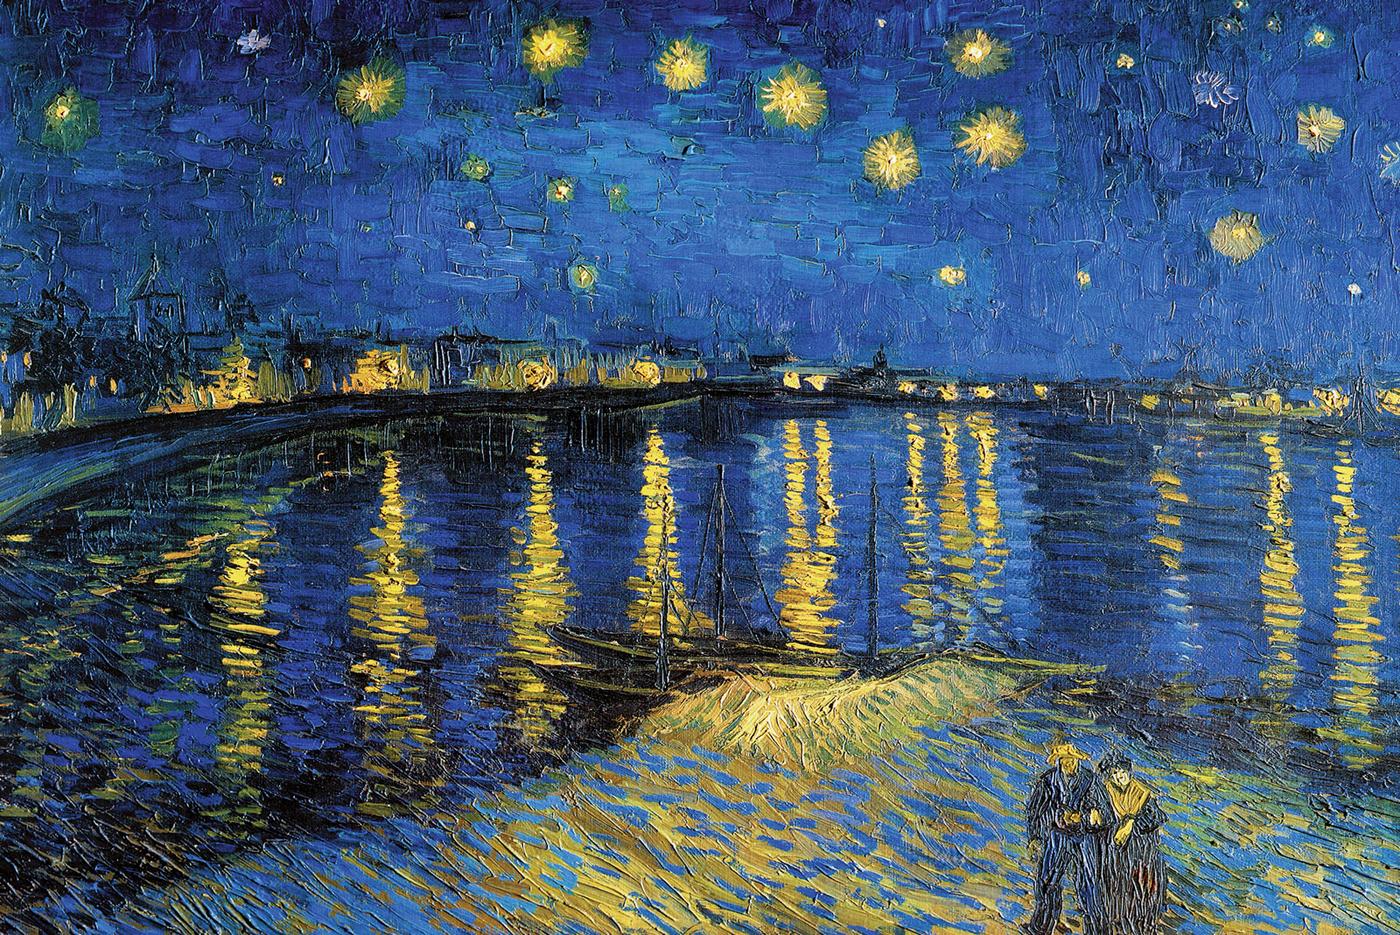 Van Gogh The Starry Nght.jpg